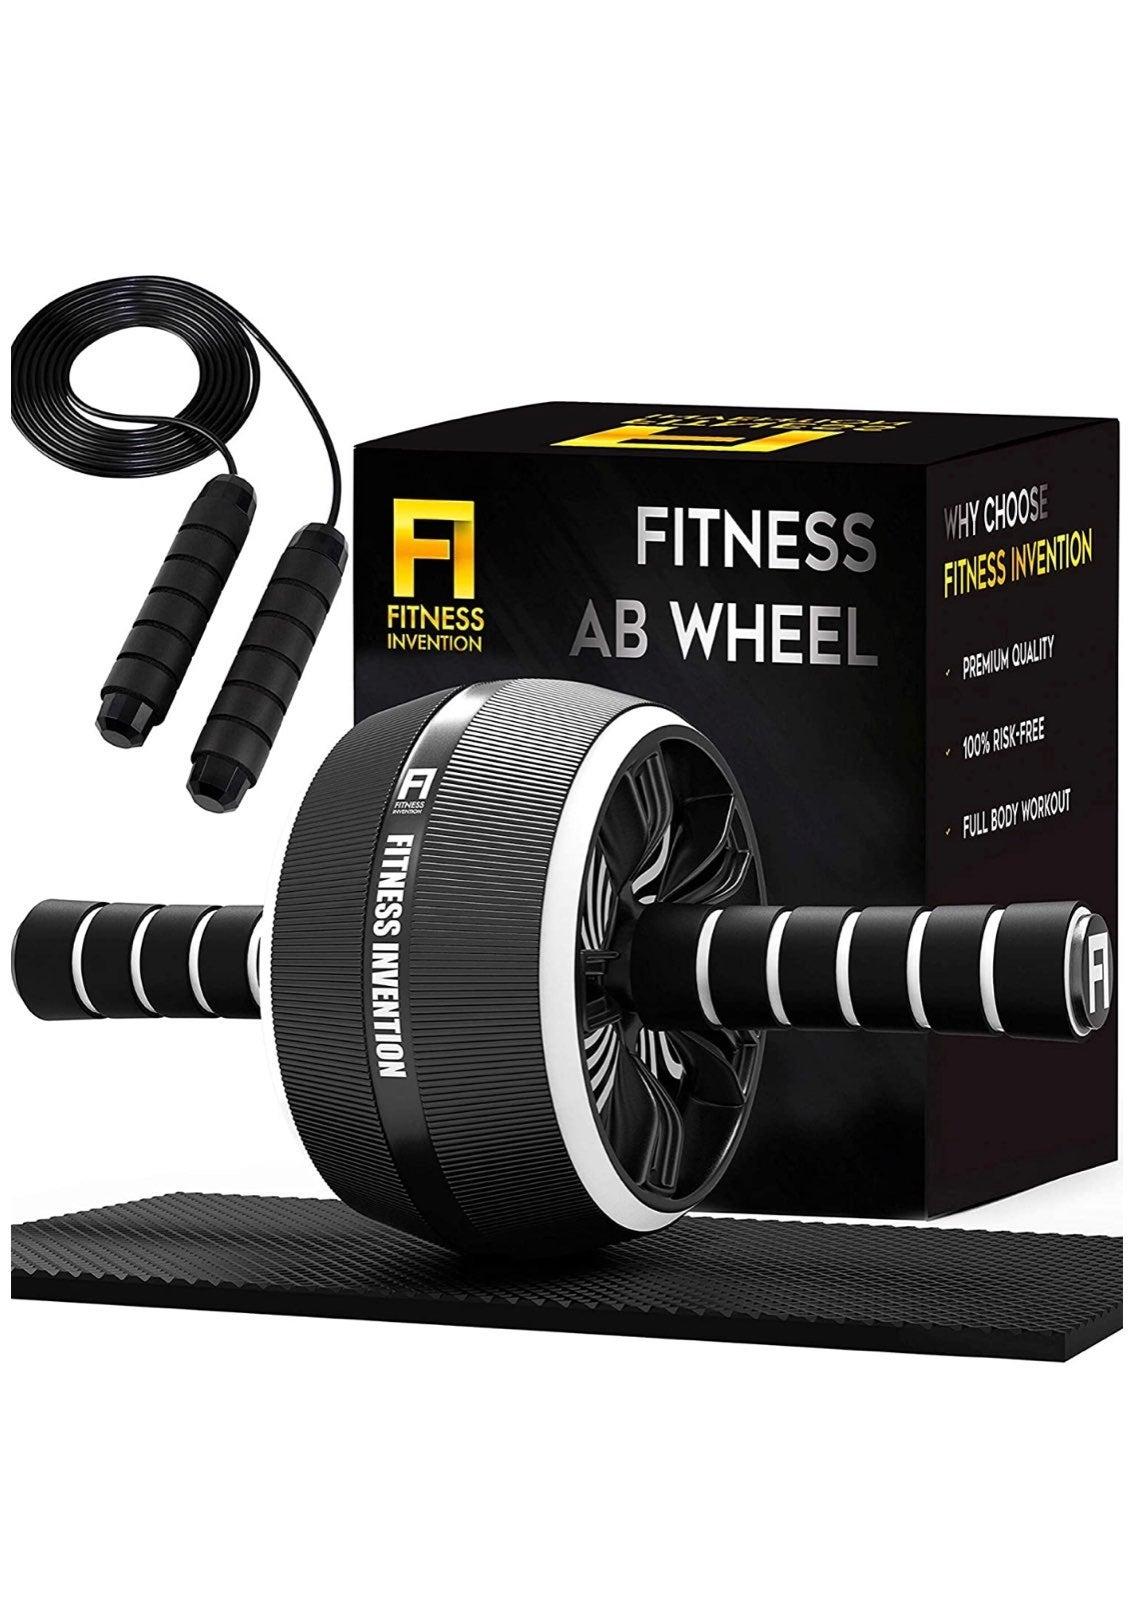 3-IN-1 Ab Wheel Roller, Mat, jump rope